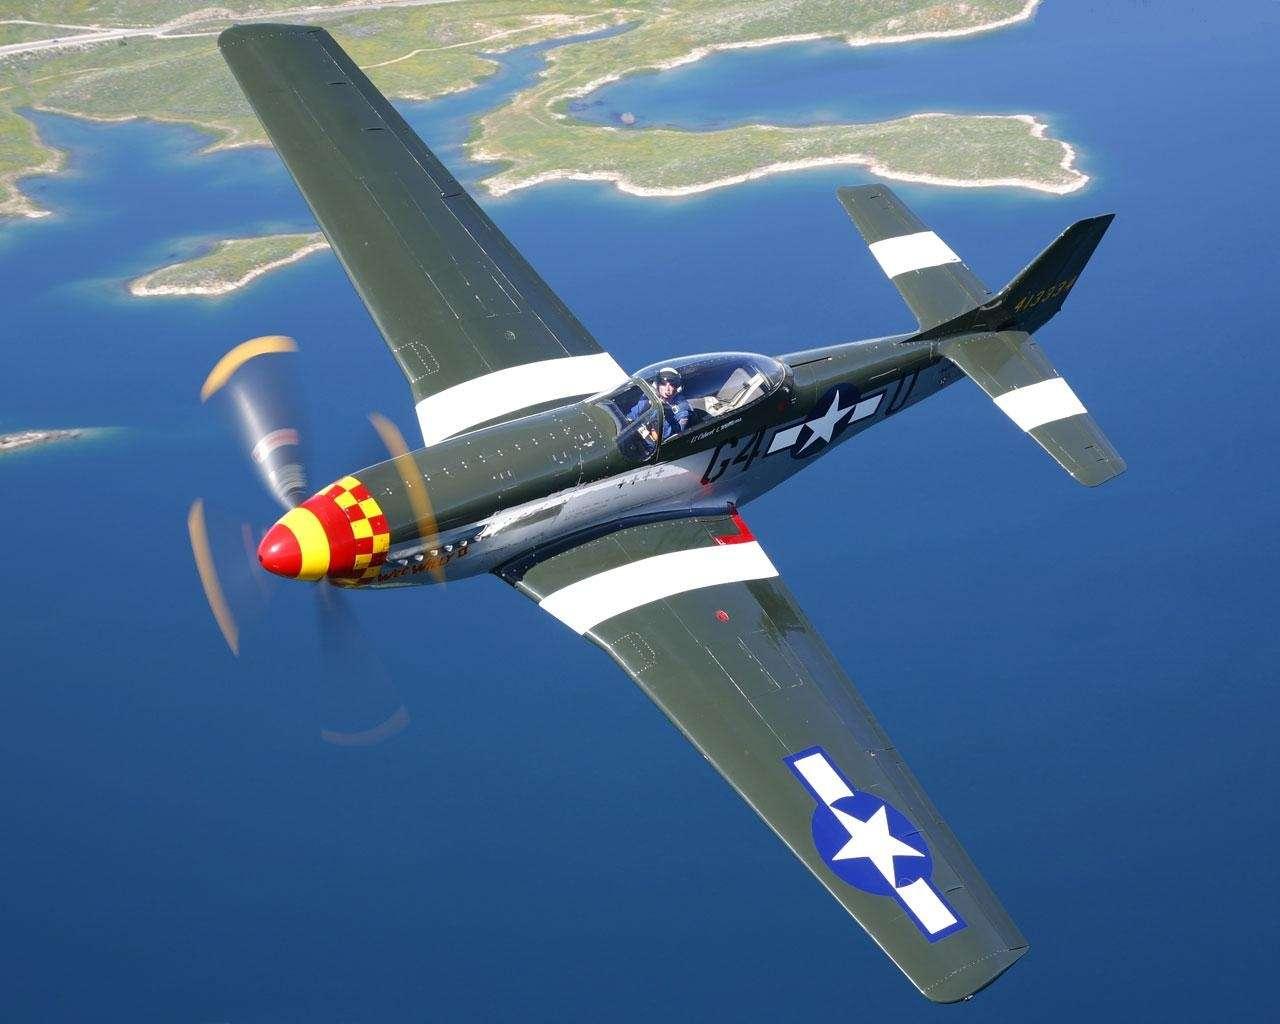 North American P 51d Mustang Wallpaper Hd Wallpapers 1280x1024